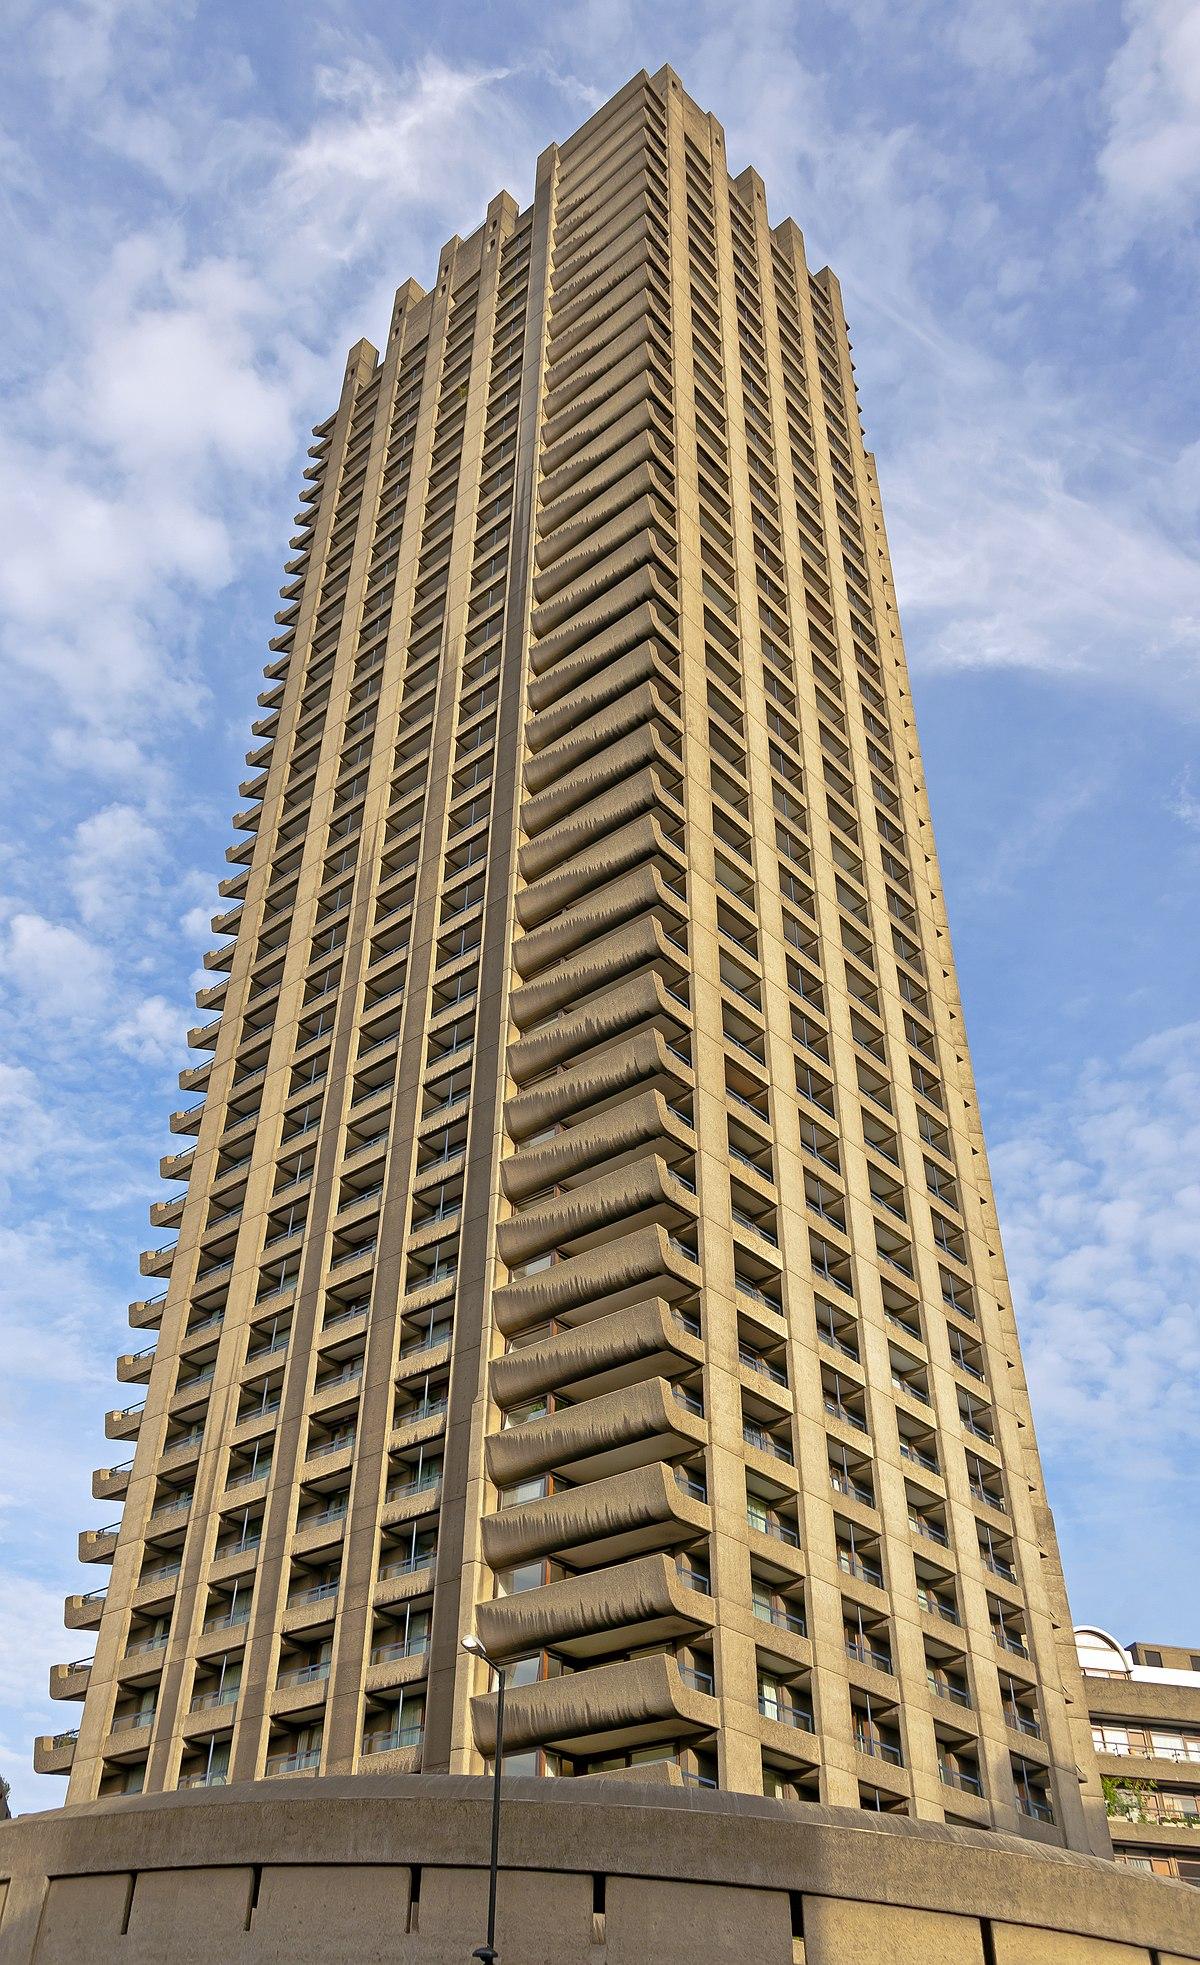 London Building Renovation